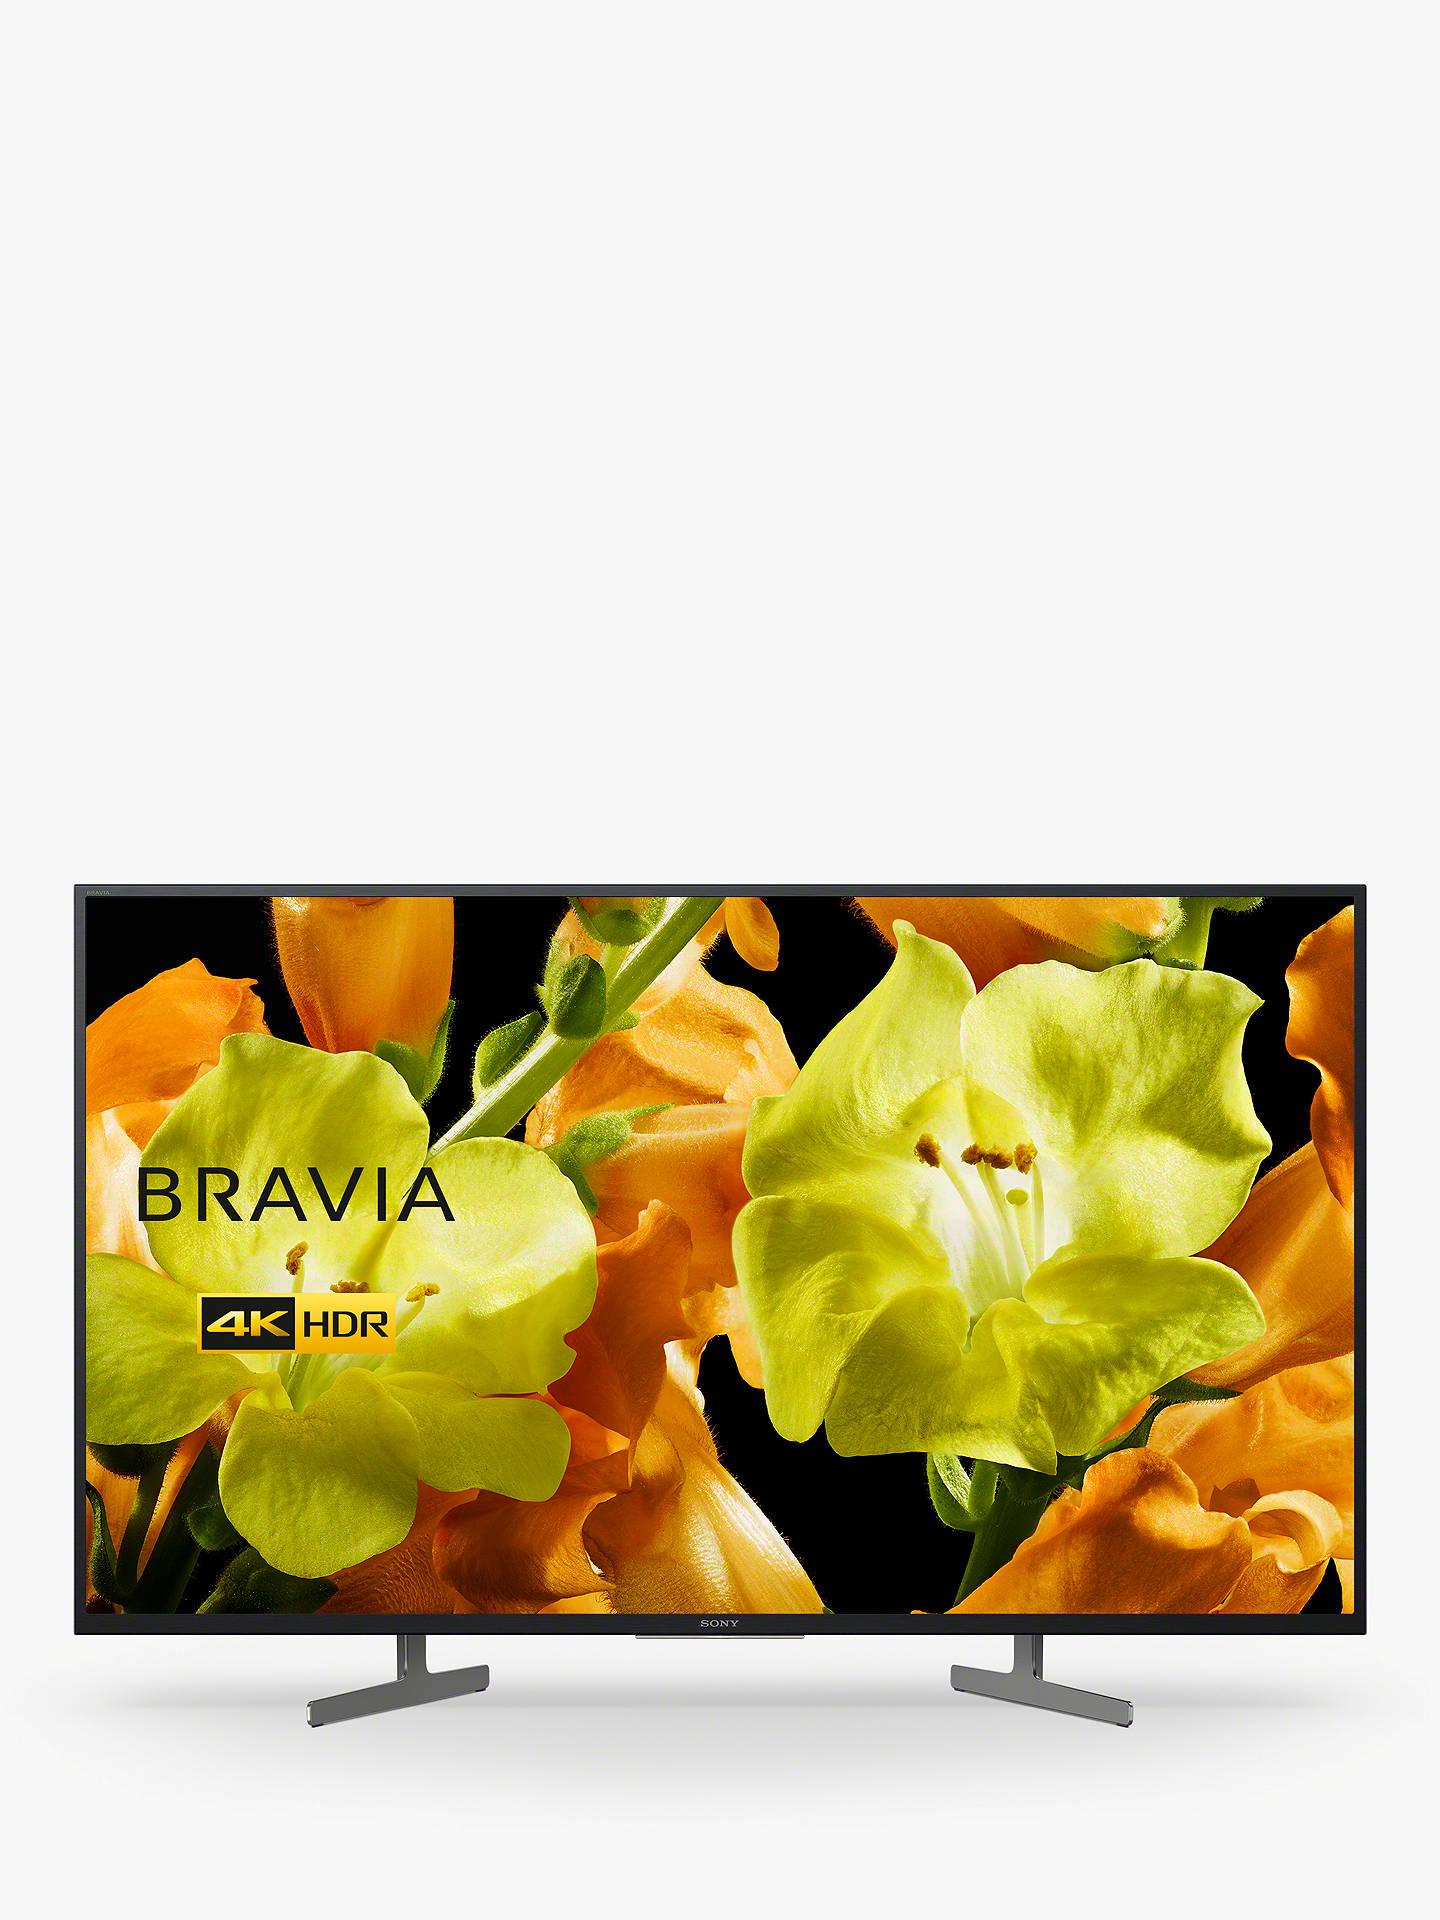 857b6ab23 Buy Sony Bravia KD43XG8196 LED HDR 4K Ultra HD Smart Android TV